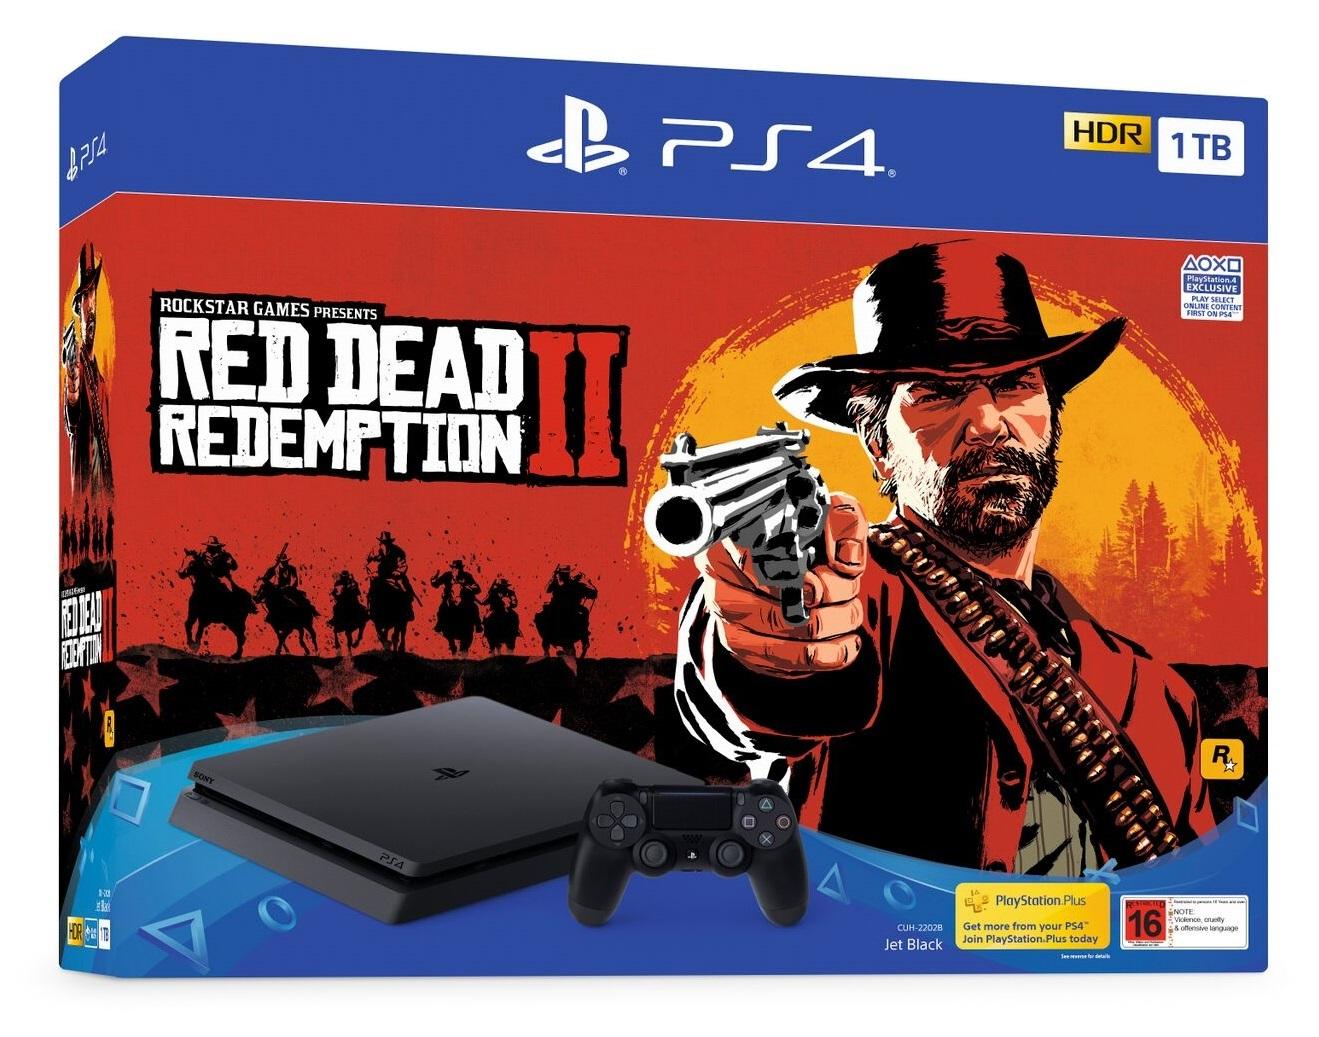 PS4 Slim 1TB Red Dead Redemption 2 Bundle for PS4 image